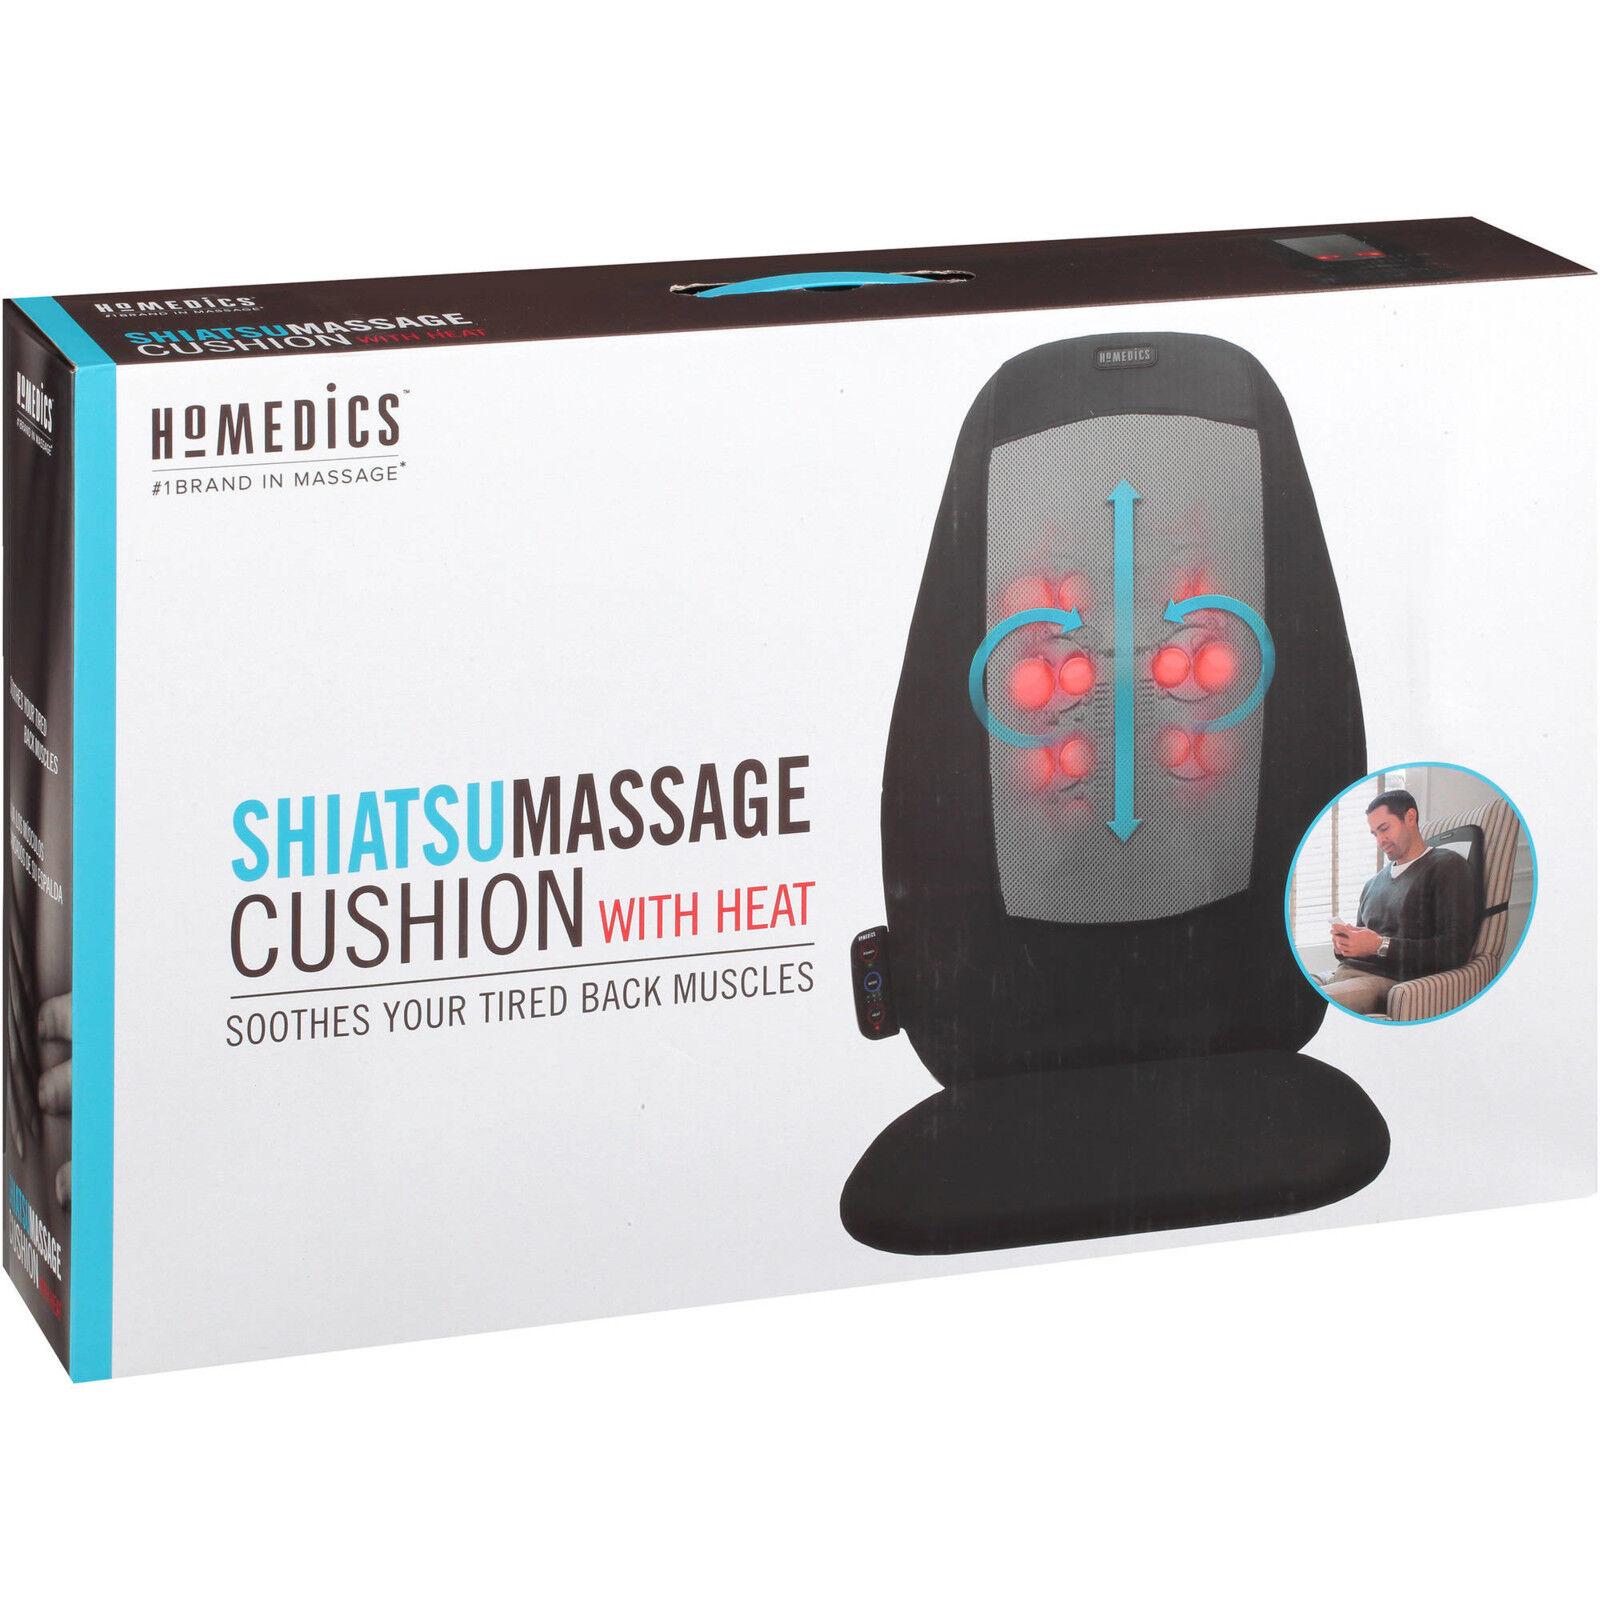 HoMedics Shiatsu Massage Cushion With Heat BRAND